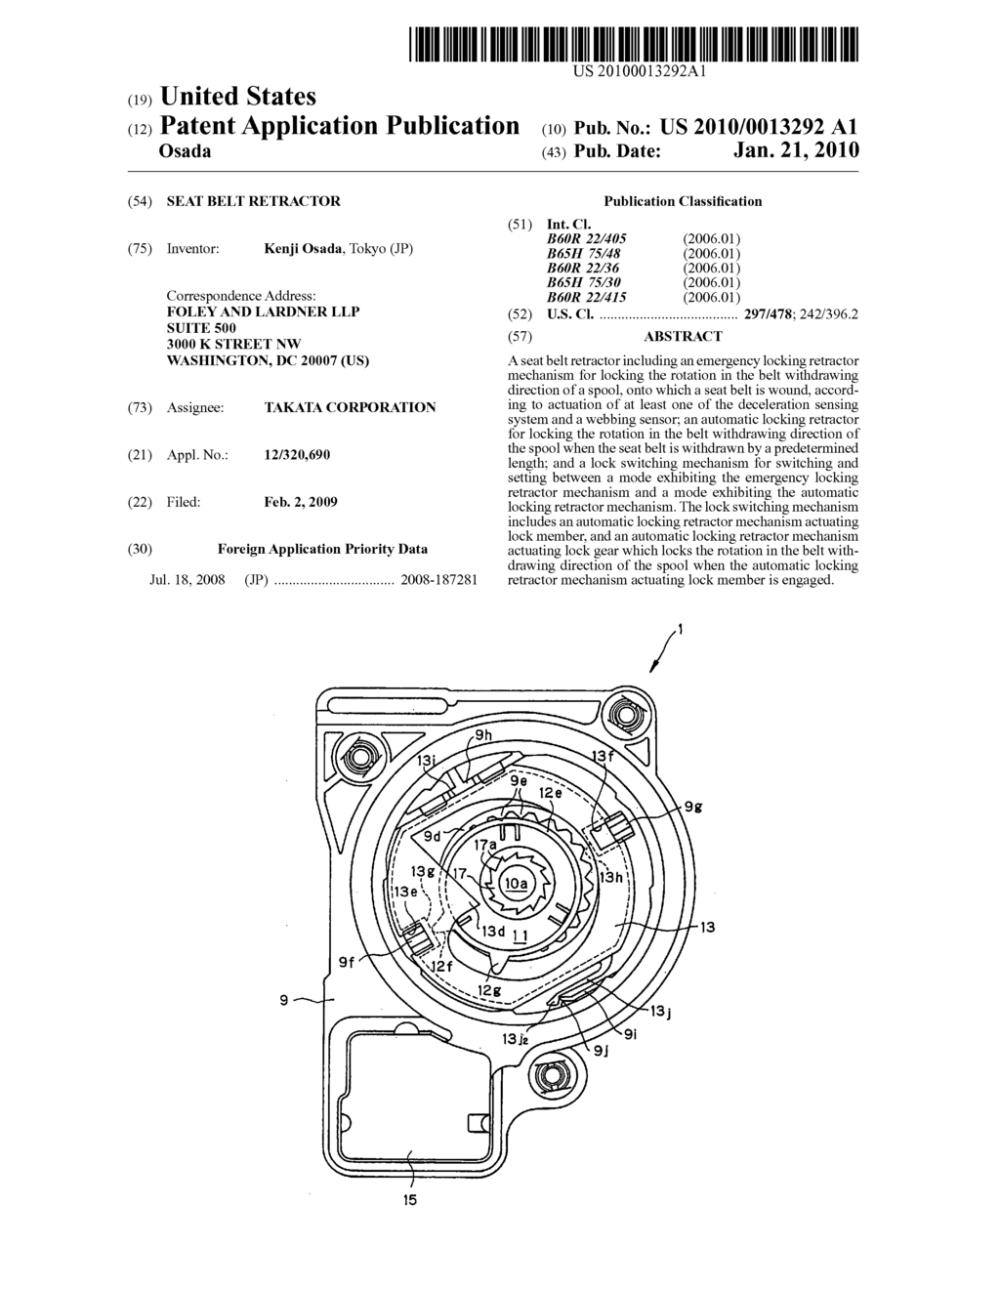 medium resolution of seat belt retractor diagrams wiring diagram sample seat belt retractor diagram schematic and image